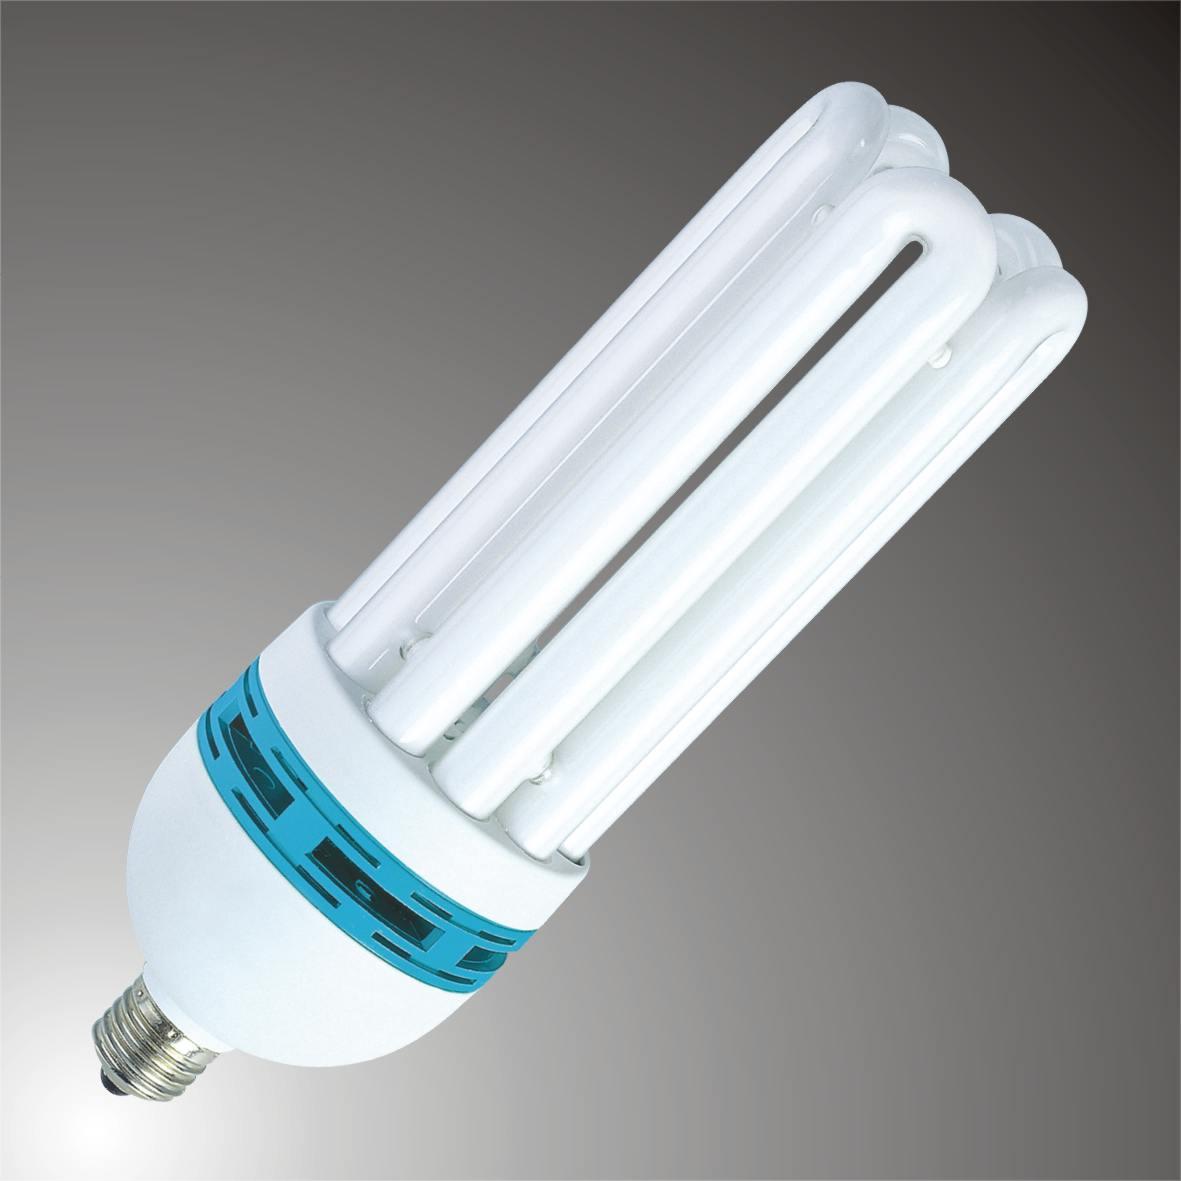 energy saving lamps photo - 10